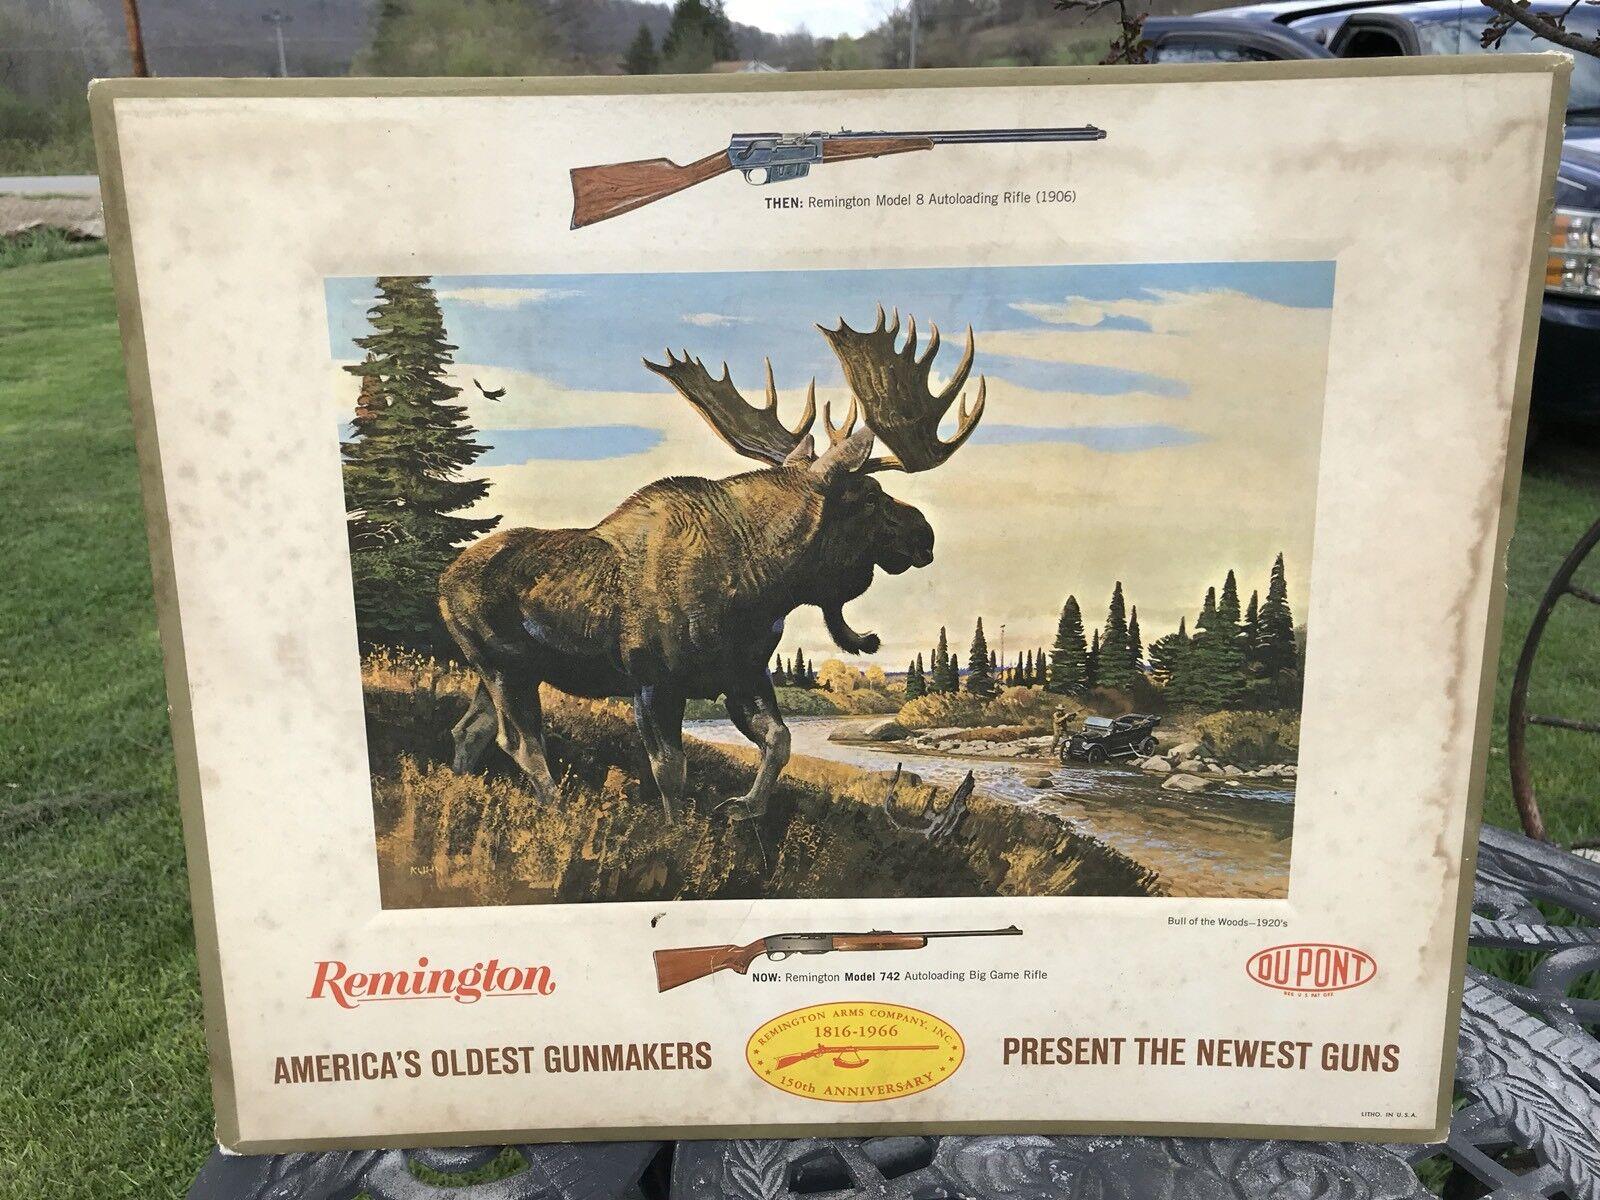 1966 Remington cartón Mostrador Publicidad, Bull del bosque década de 1920